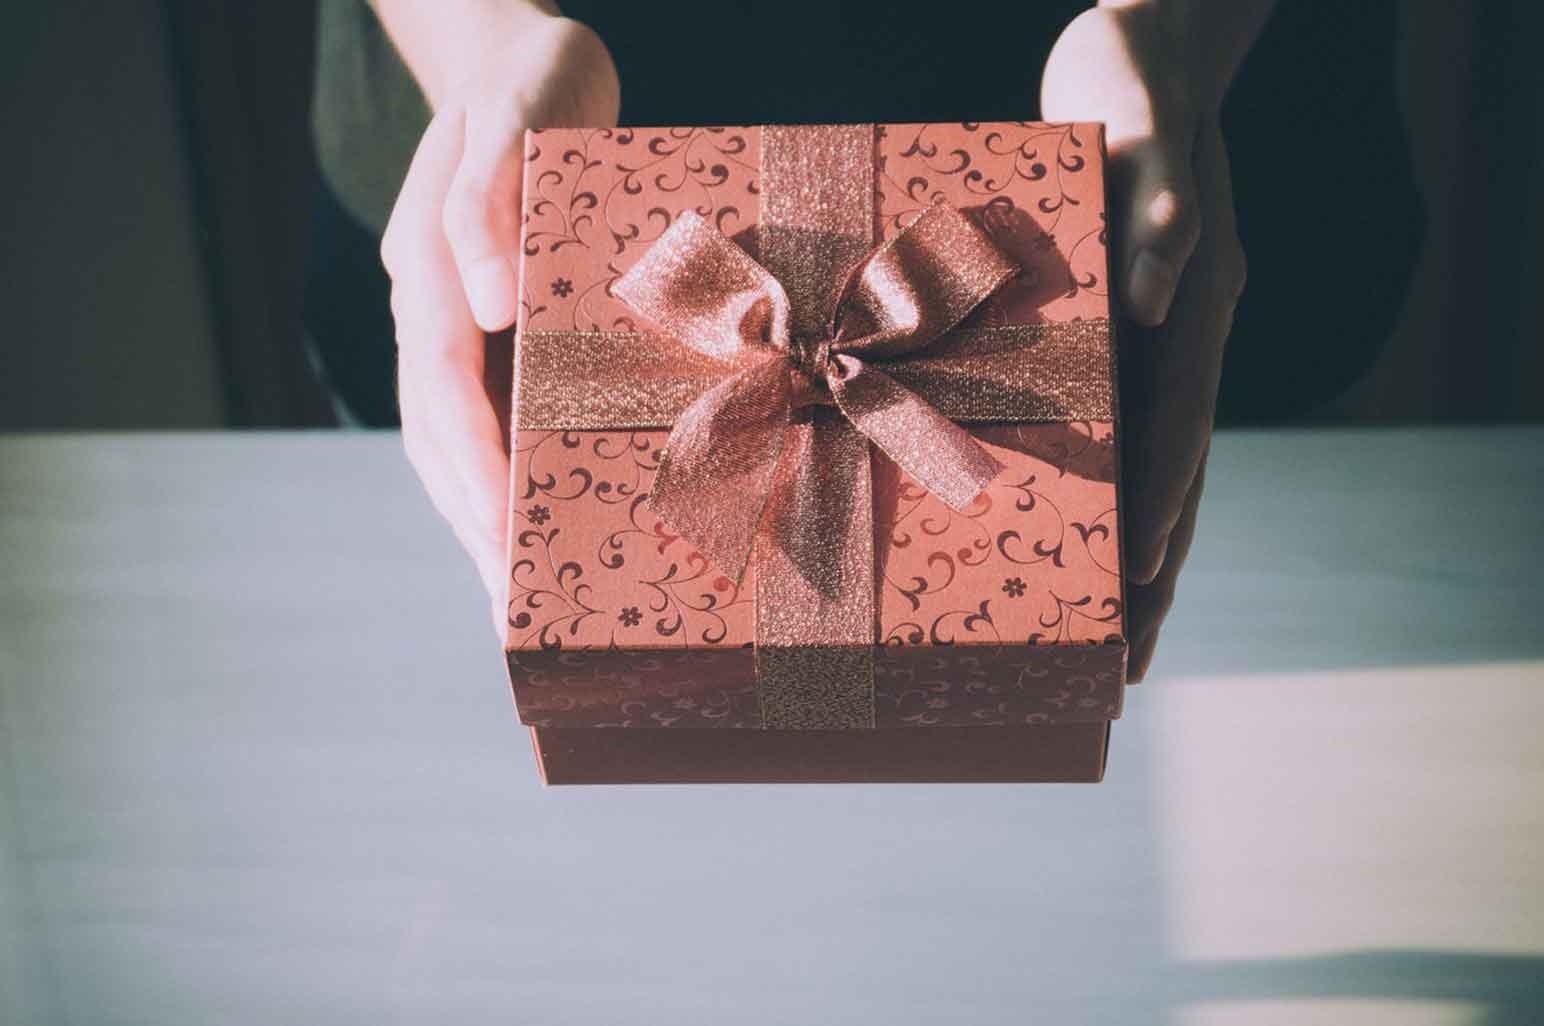 Creative Handmade Gift Ideas